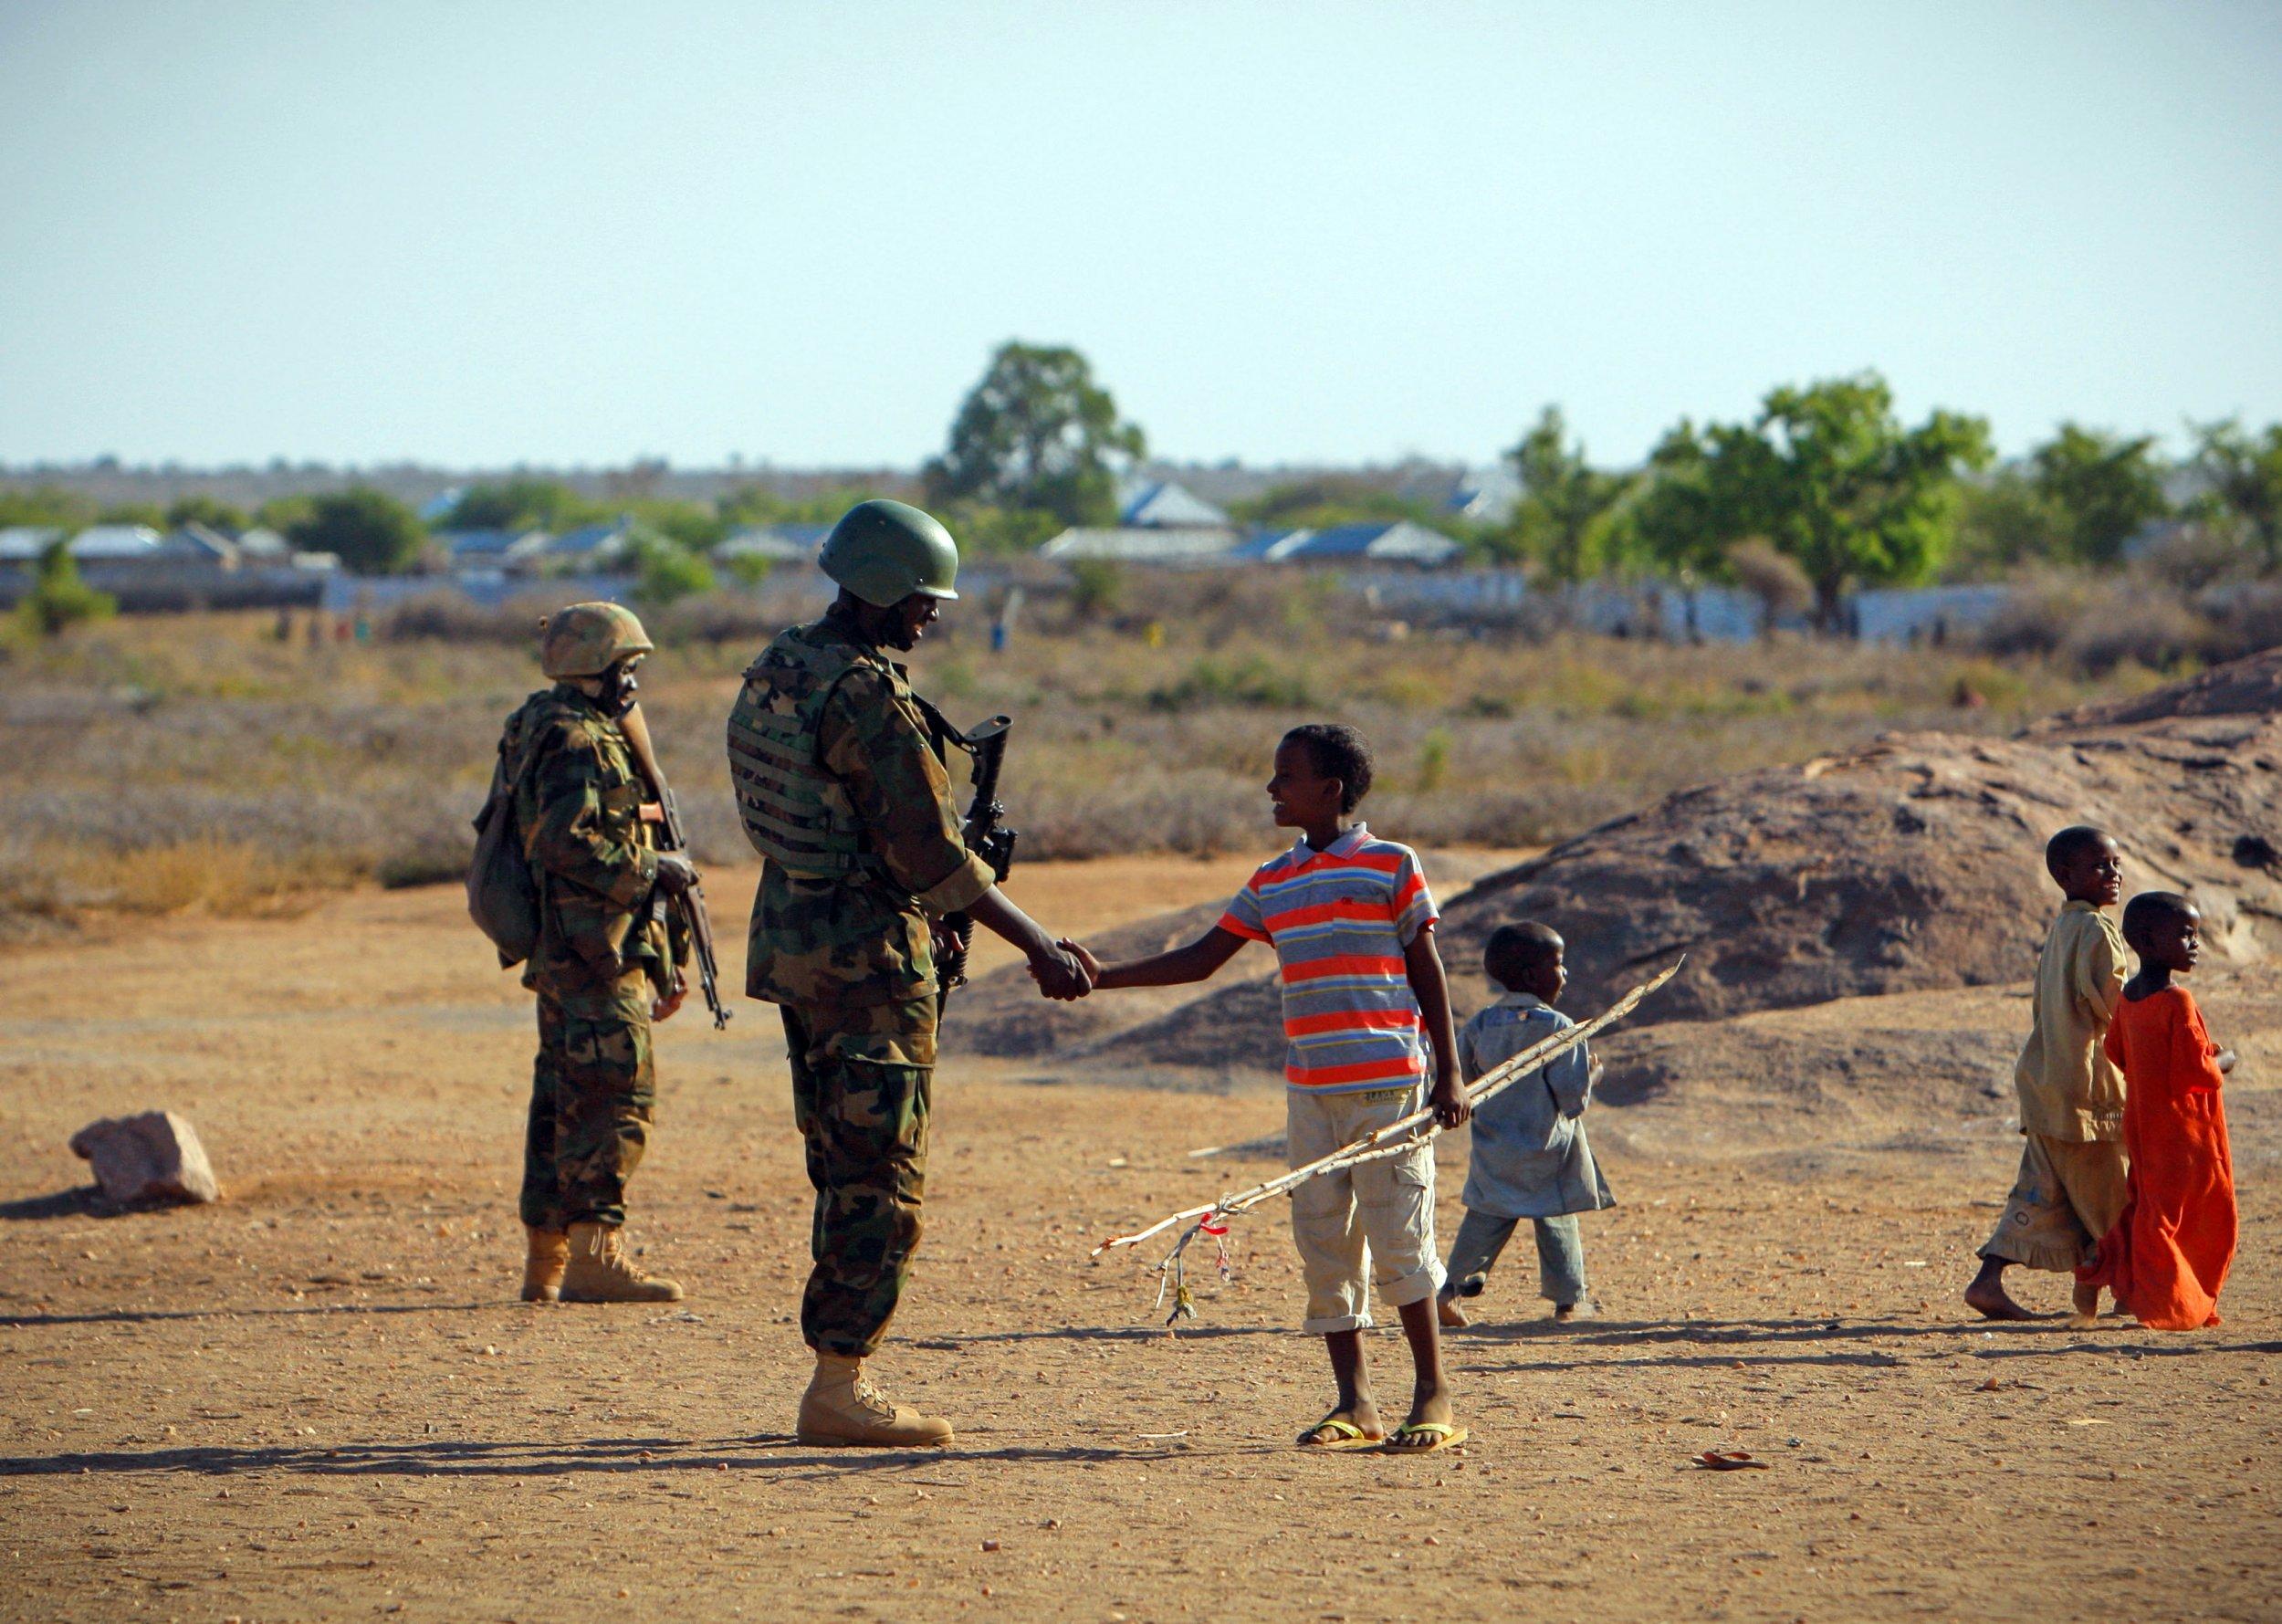 Somalia children soldier